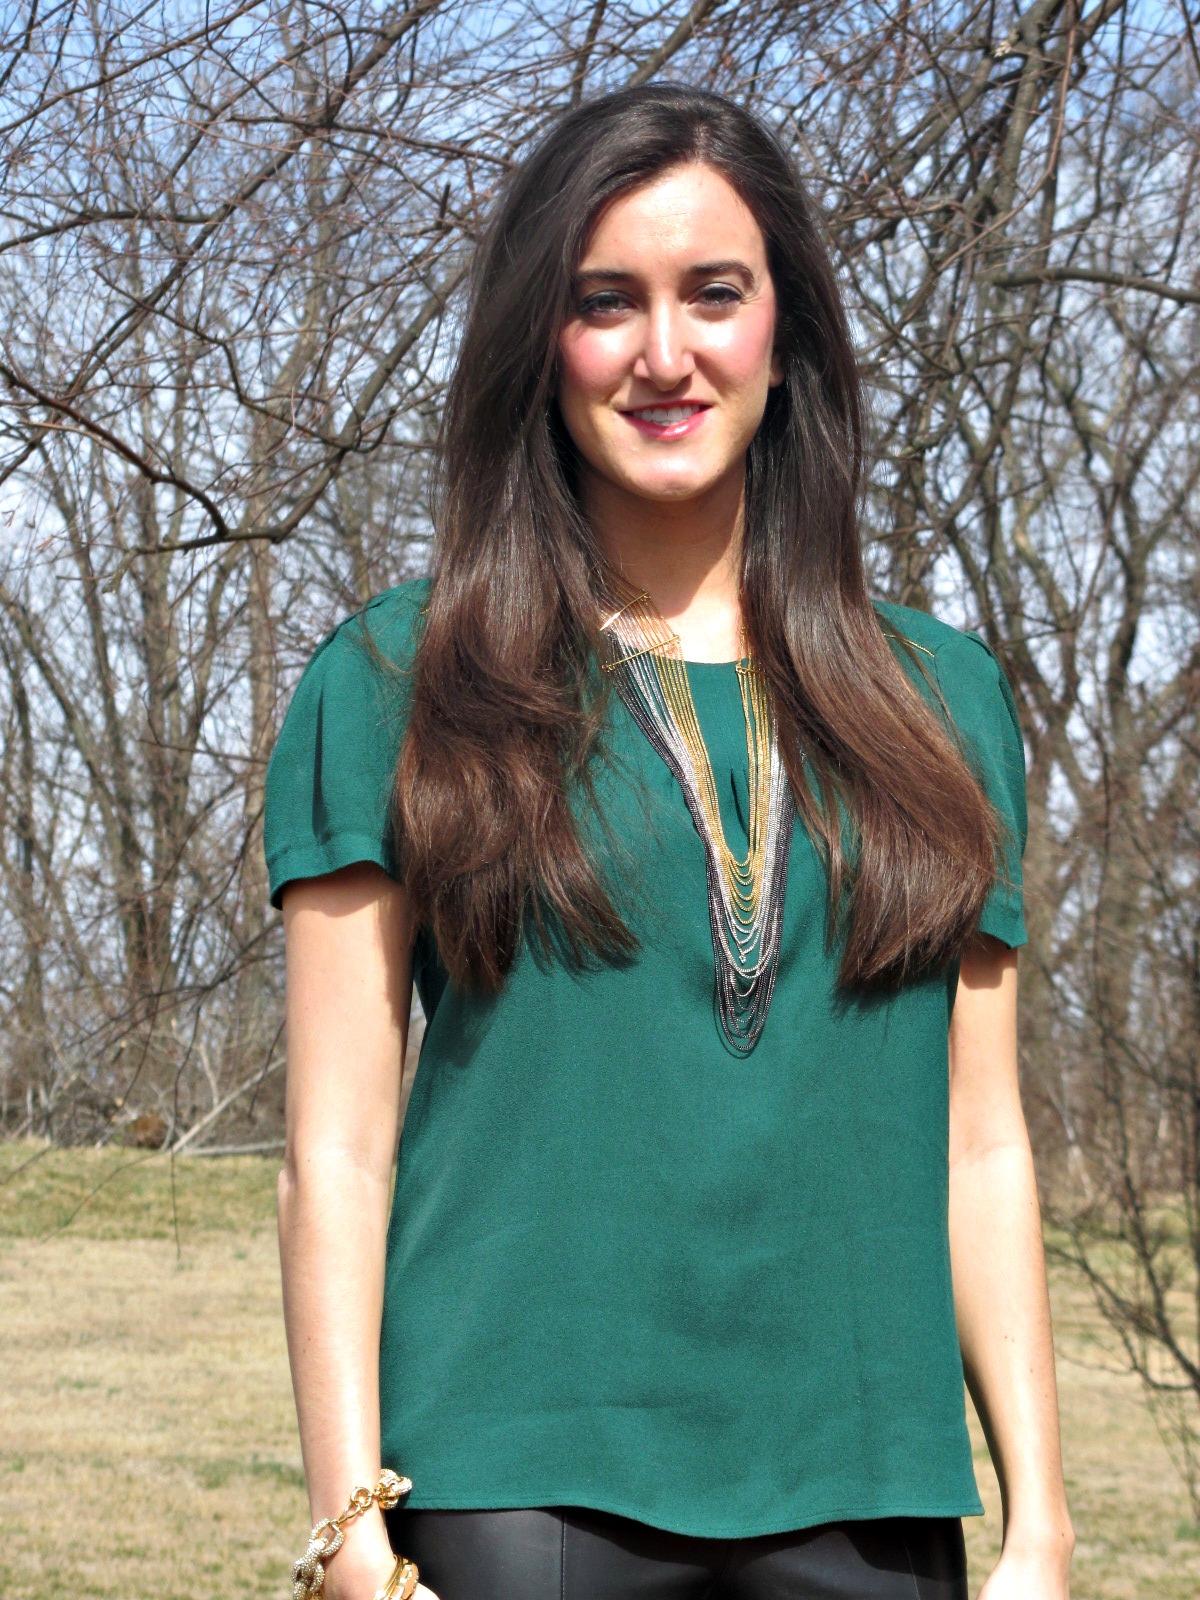 Green Zara Top, BCBG necklace